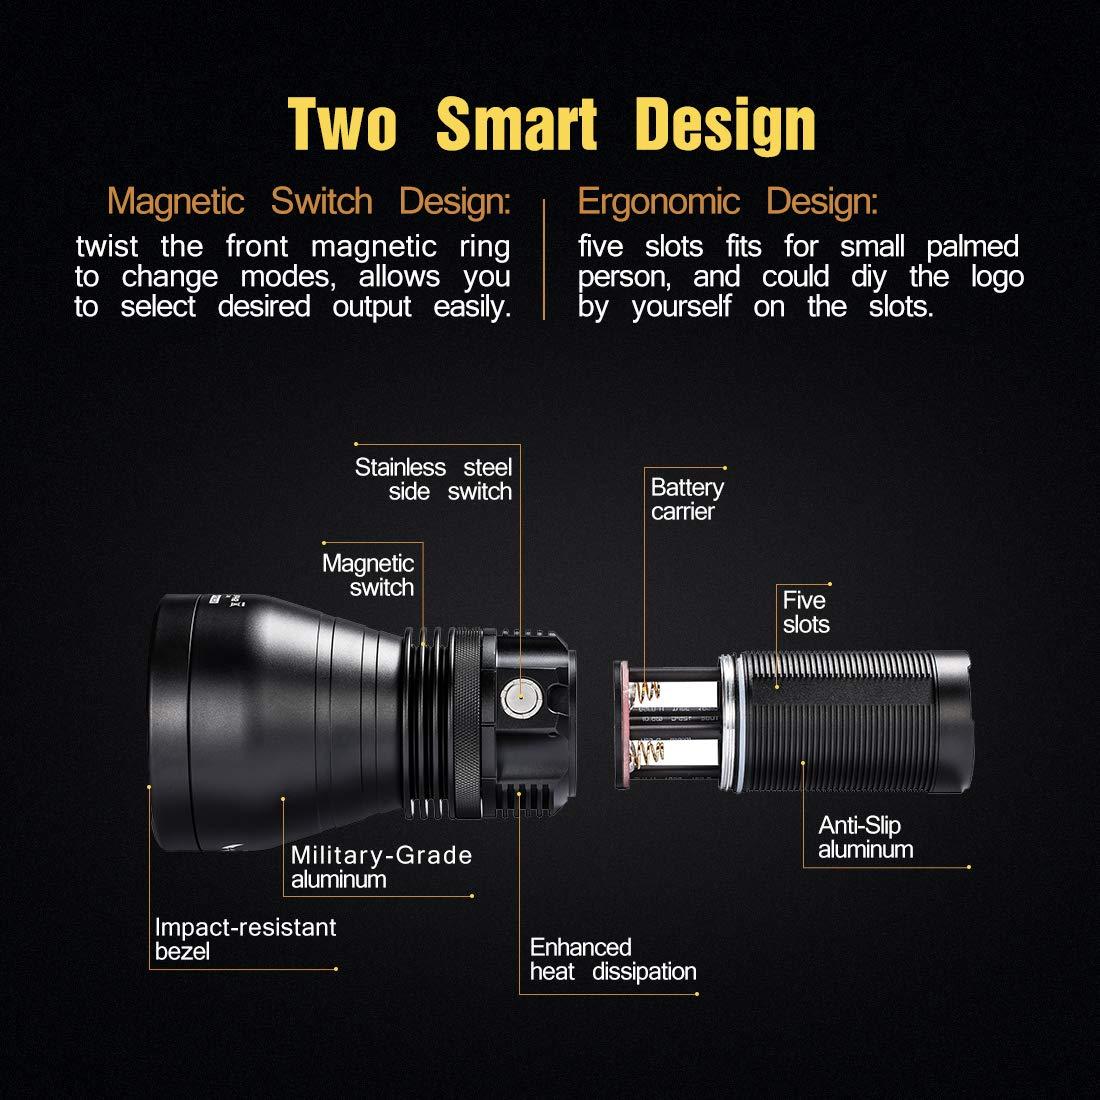 Niwalker Tactical Portable LED Flashlight Handheld Rechargeable High Lumen with Strobe IPX7 Waterproof Pocket Flashlight